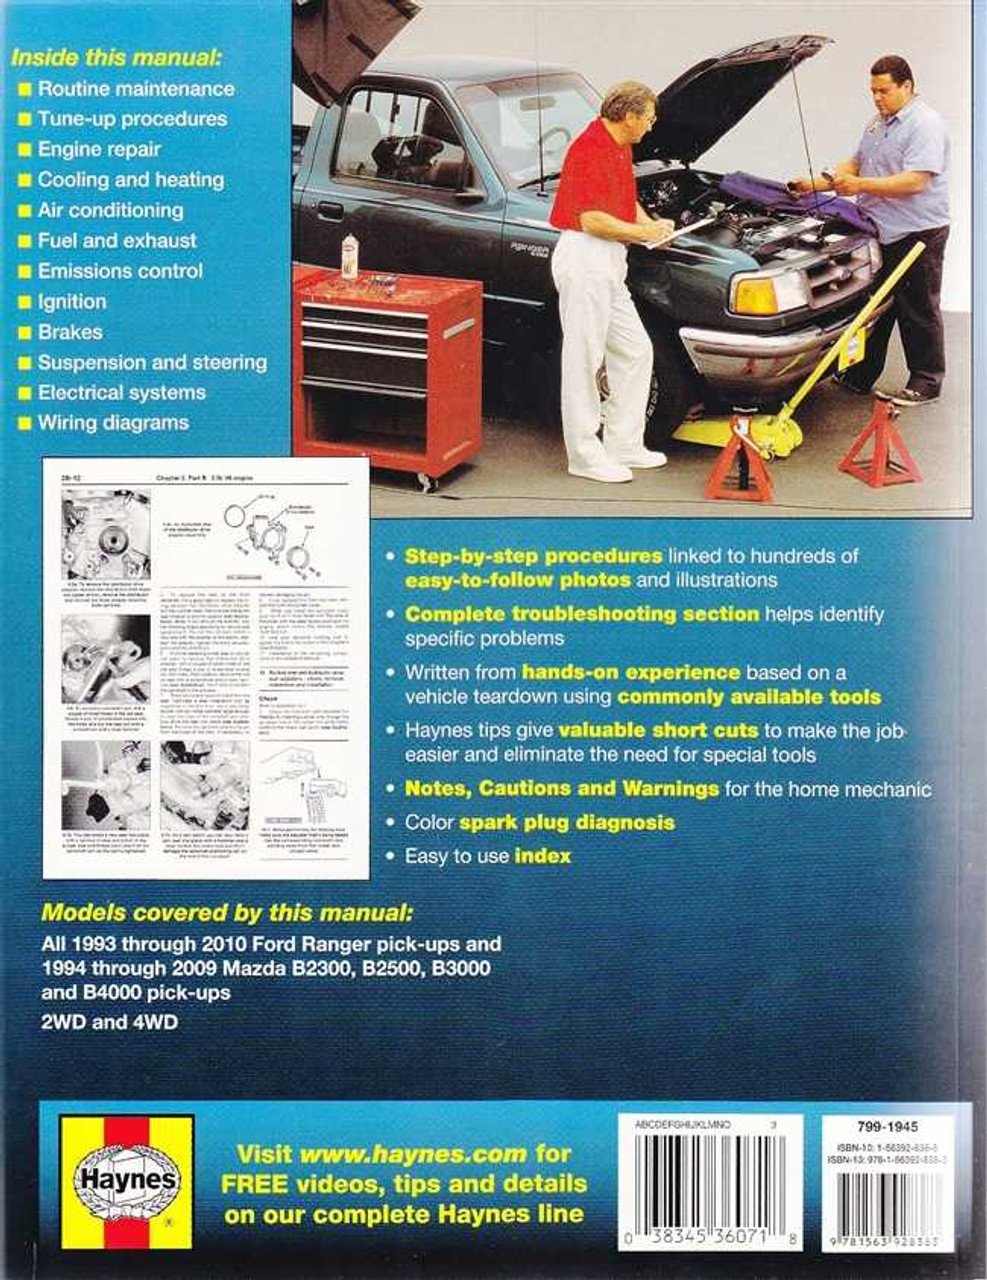 Ford Ranger, Mazda B2300, B2500, B3000, B4000 1993 - 2011 Workshop Manual